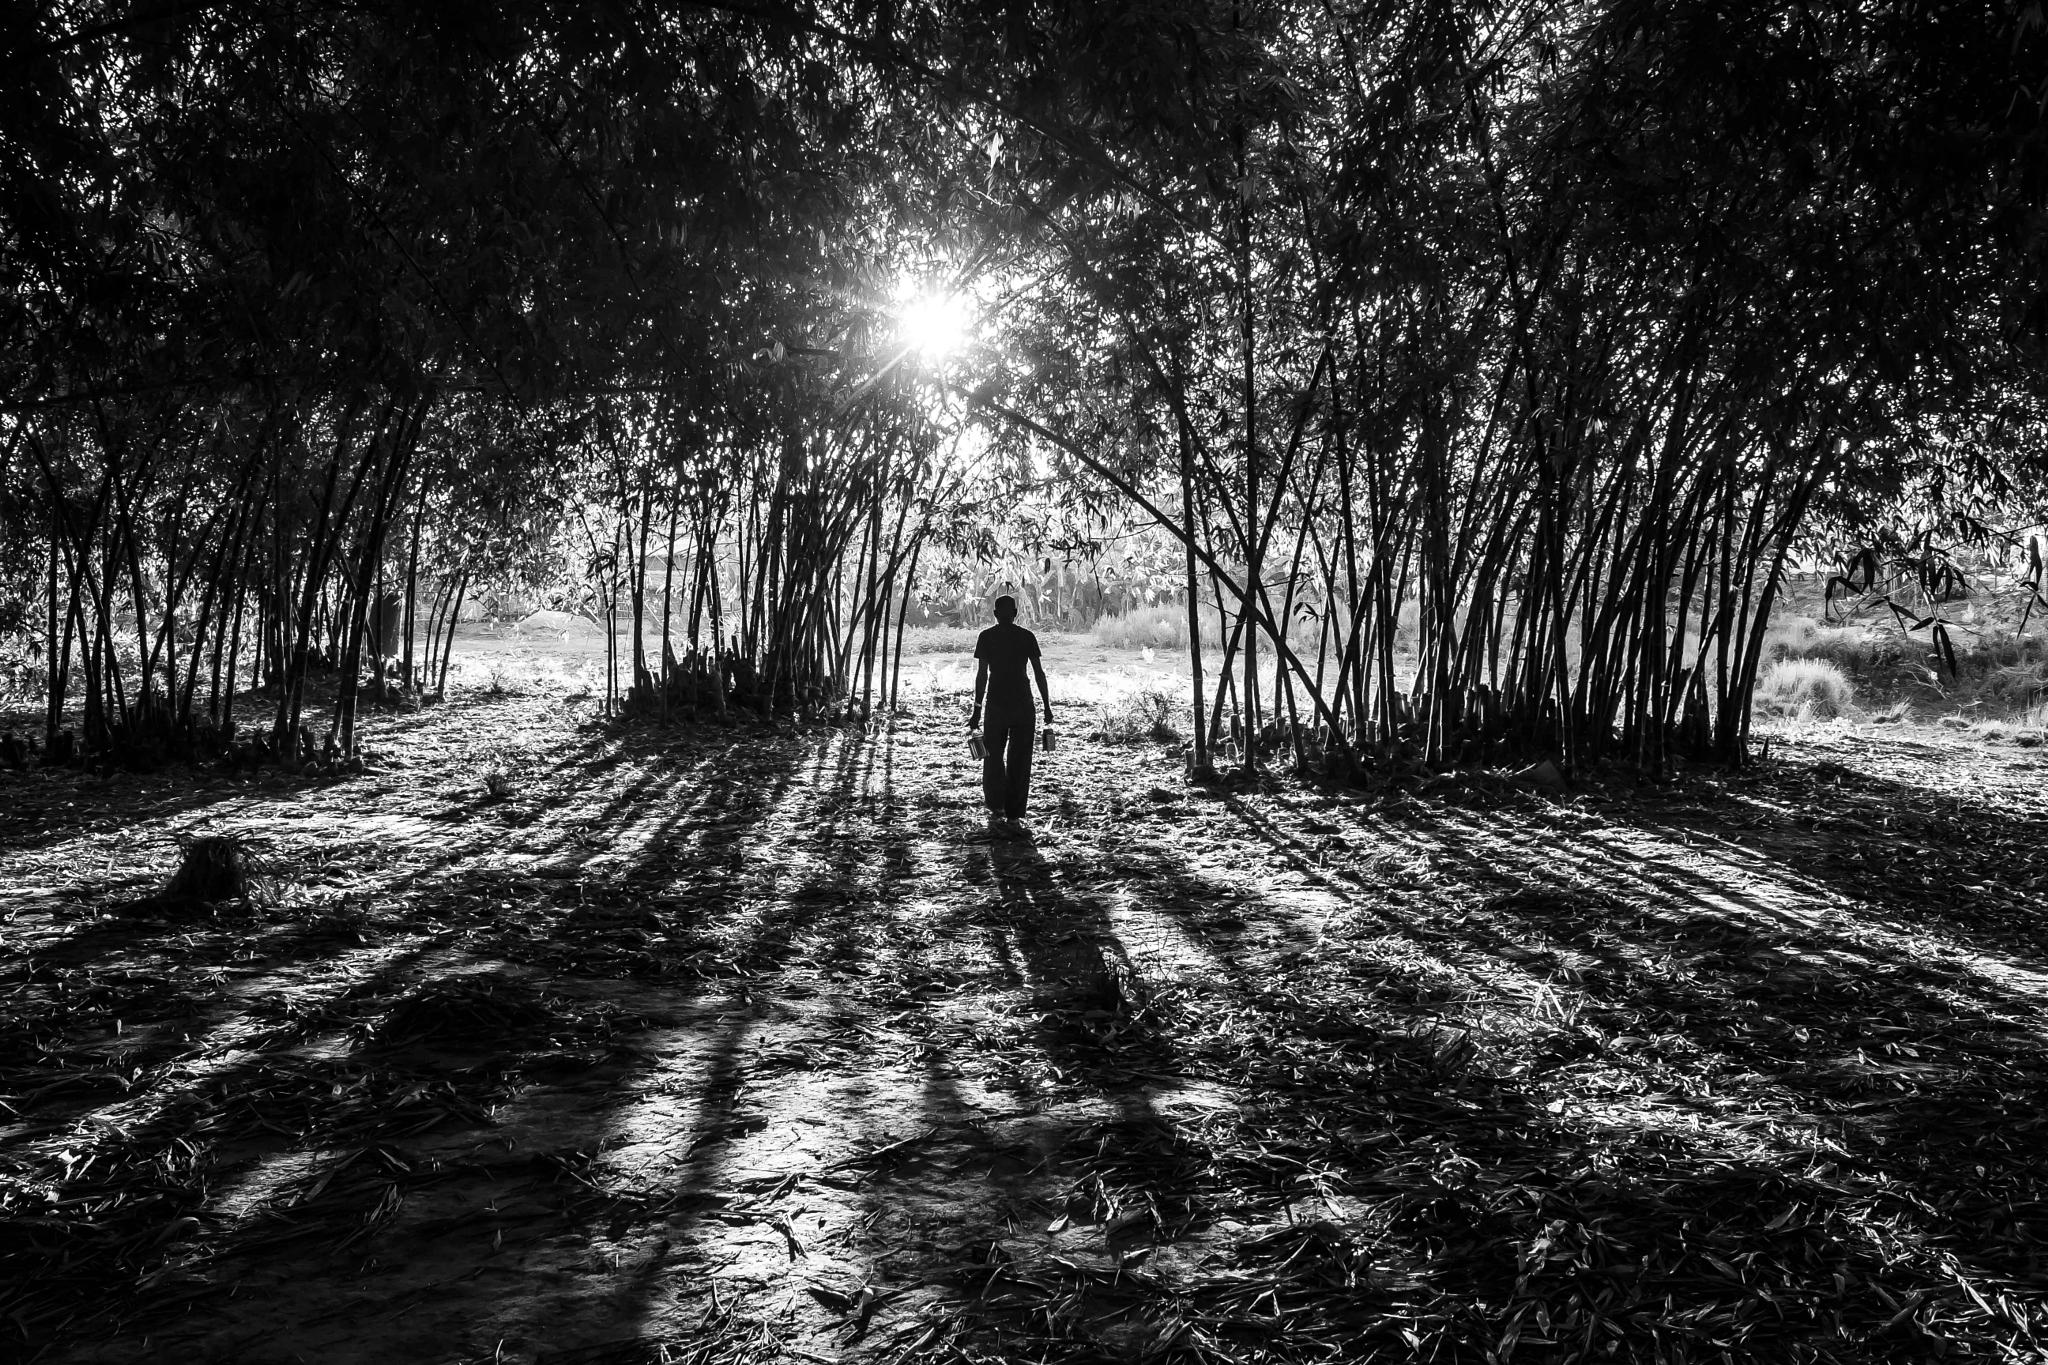 Untitled by riteshsinghsiddharth